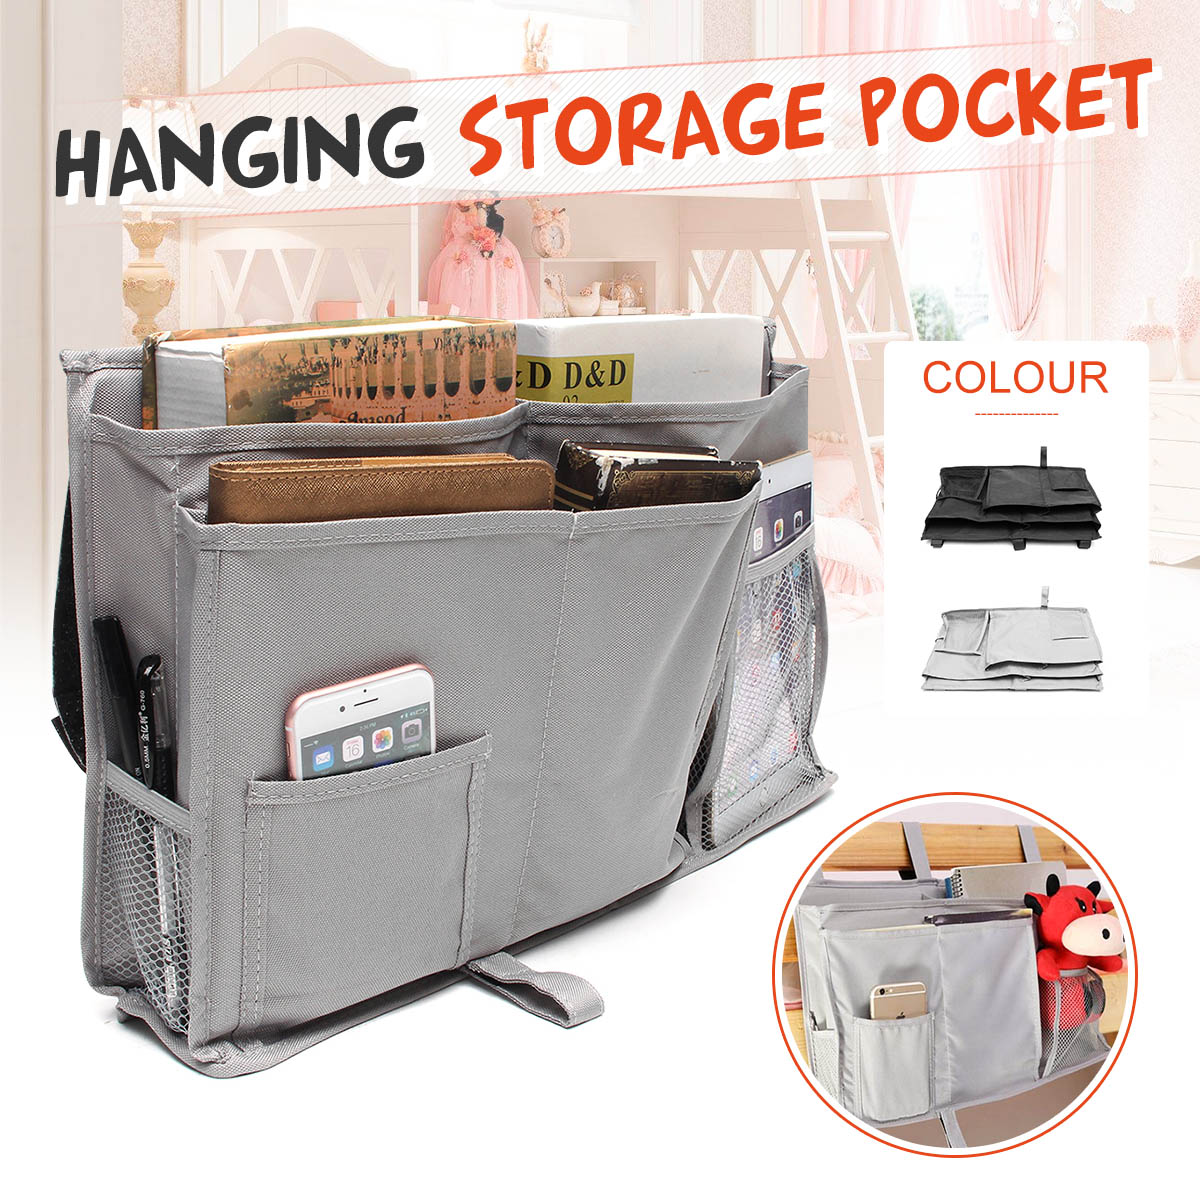 50x30cm/ 19.69x11.81'' Bedside Caddy, 8 Pockets Hanging Storage Bag Organizer Holder for Bunk Dorm Rooms & Hospital Baby Bed Rails &  Cabin Chair Storage Boxes - Grey&Black